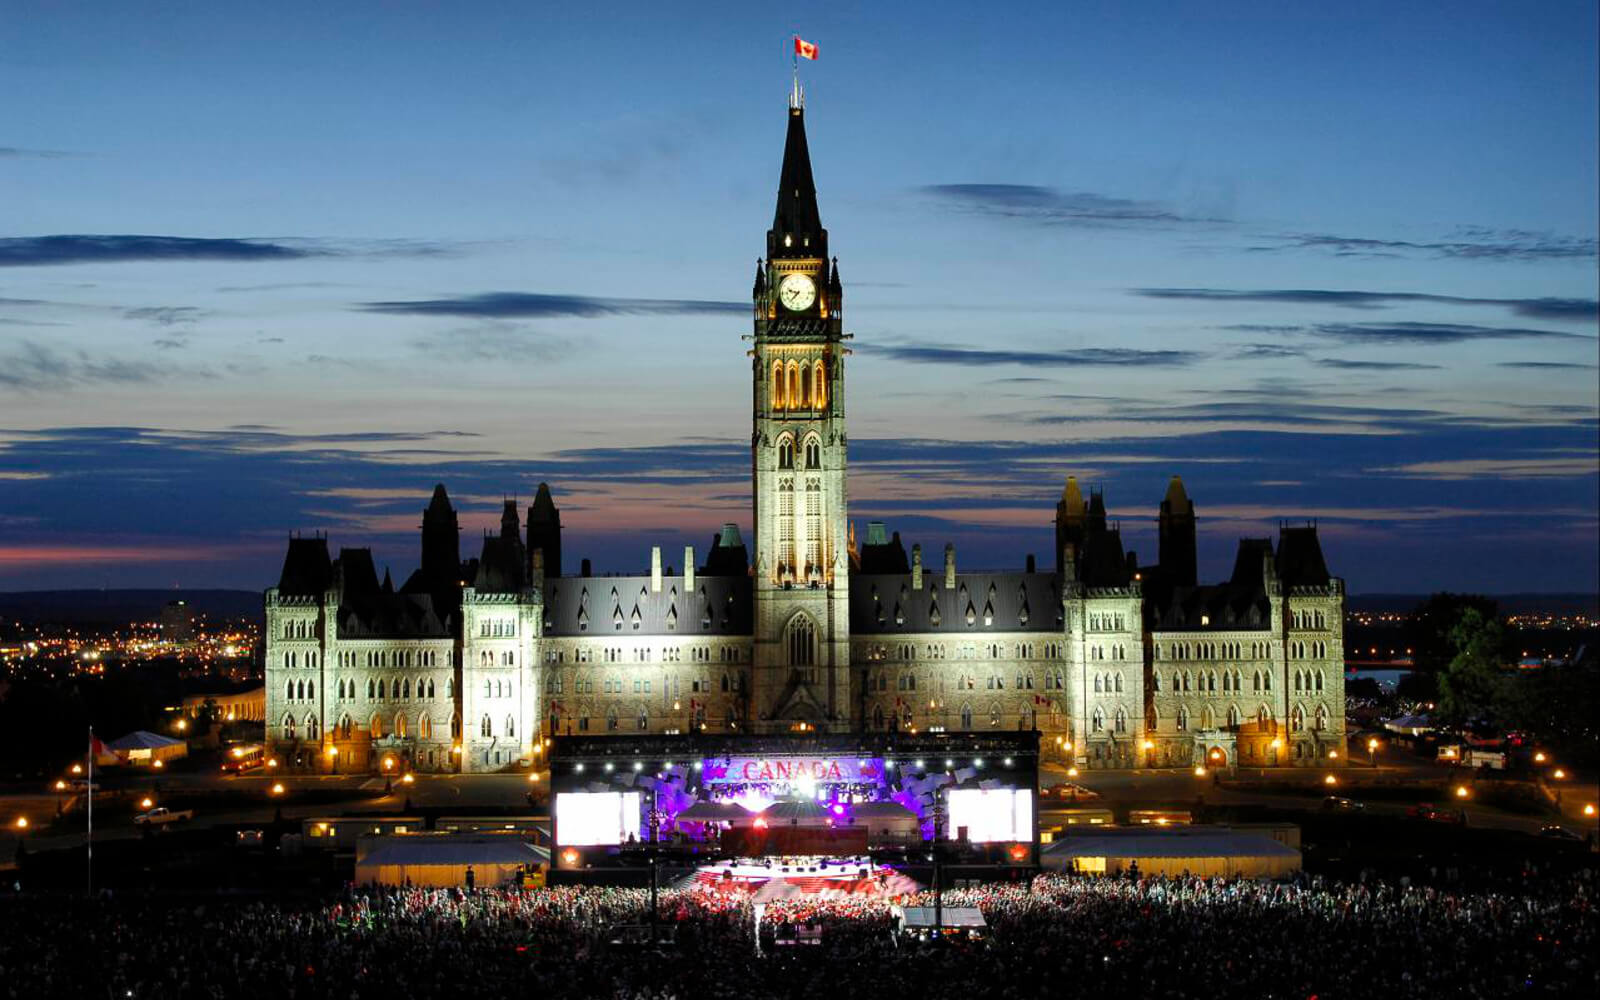 Canada Day: Parliament Hill bei Nacht